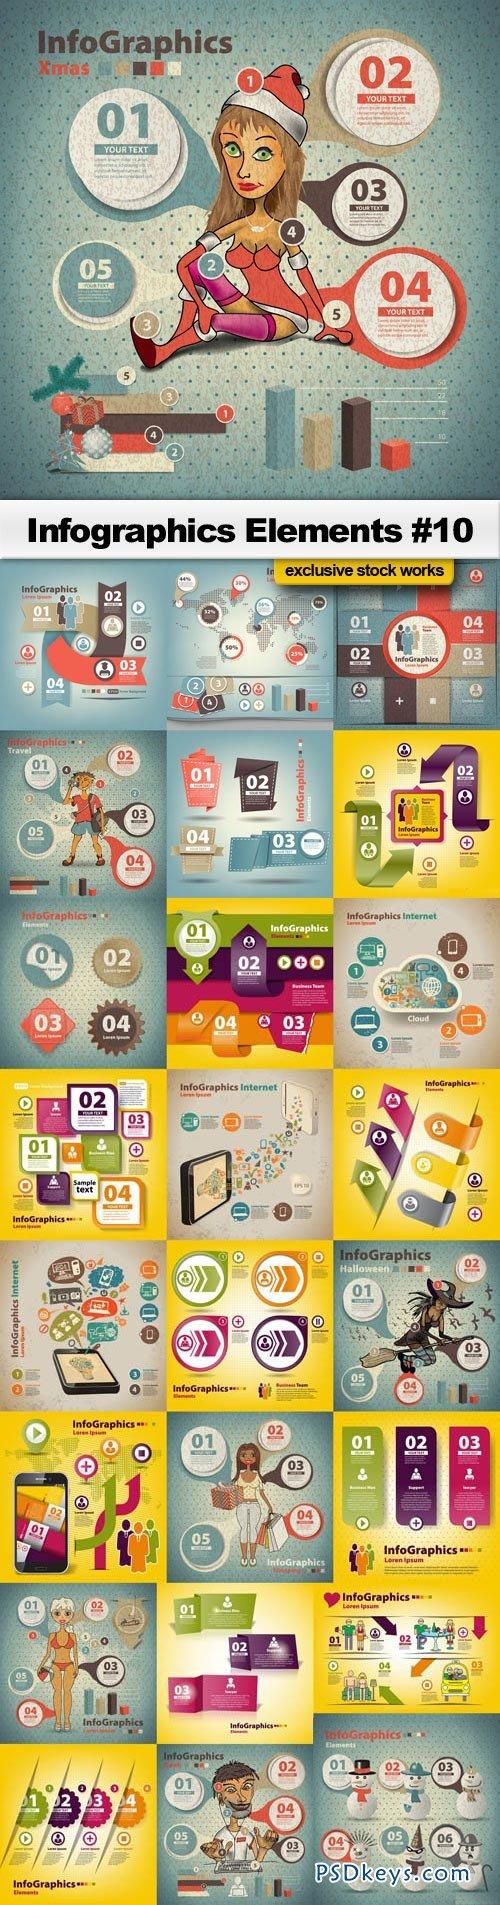 Infographics Elements #10 - 25xEPS